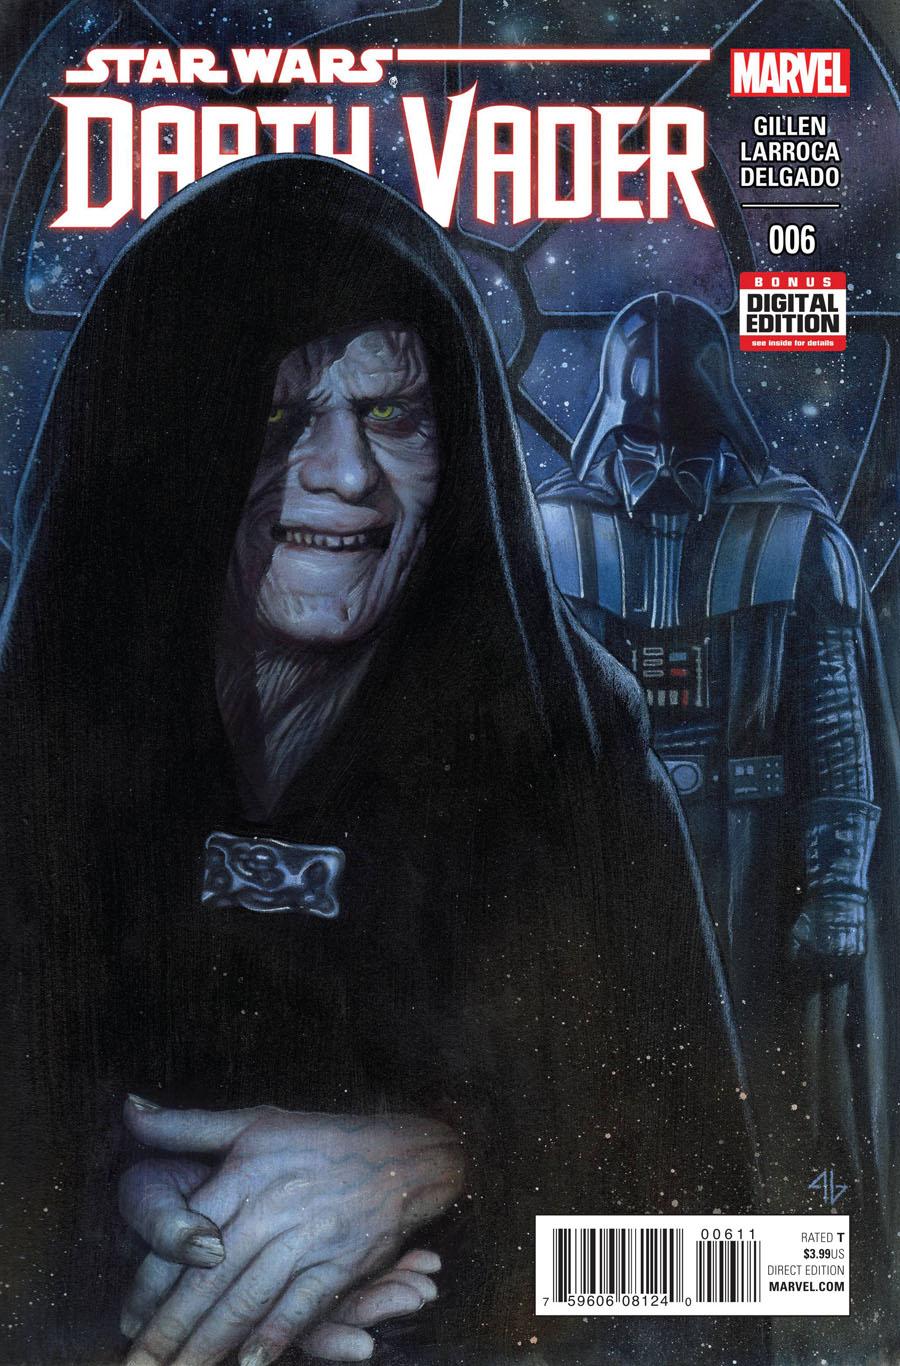 Darth Vader #6 Cover A 1st Ptg